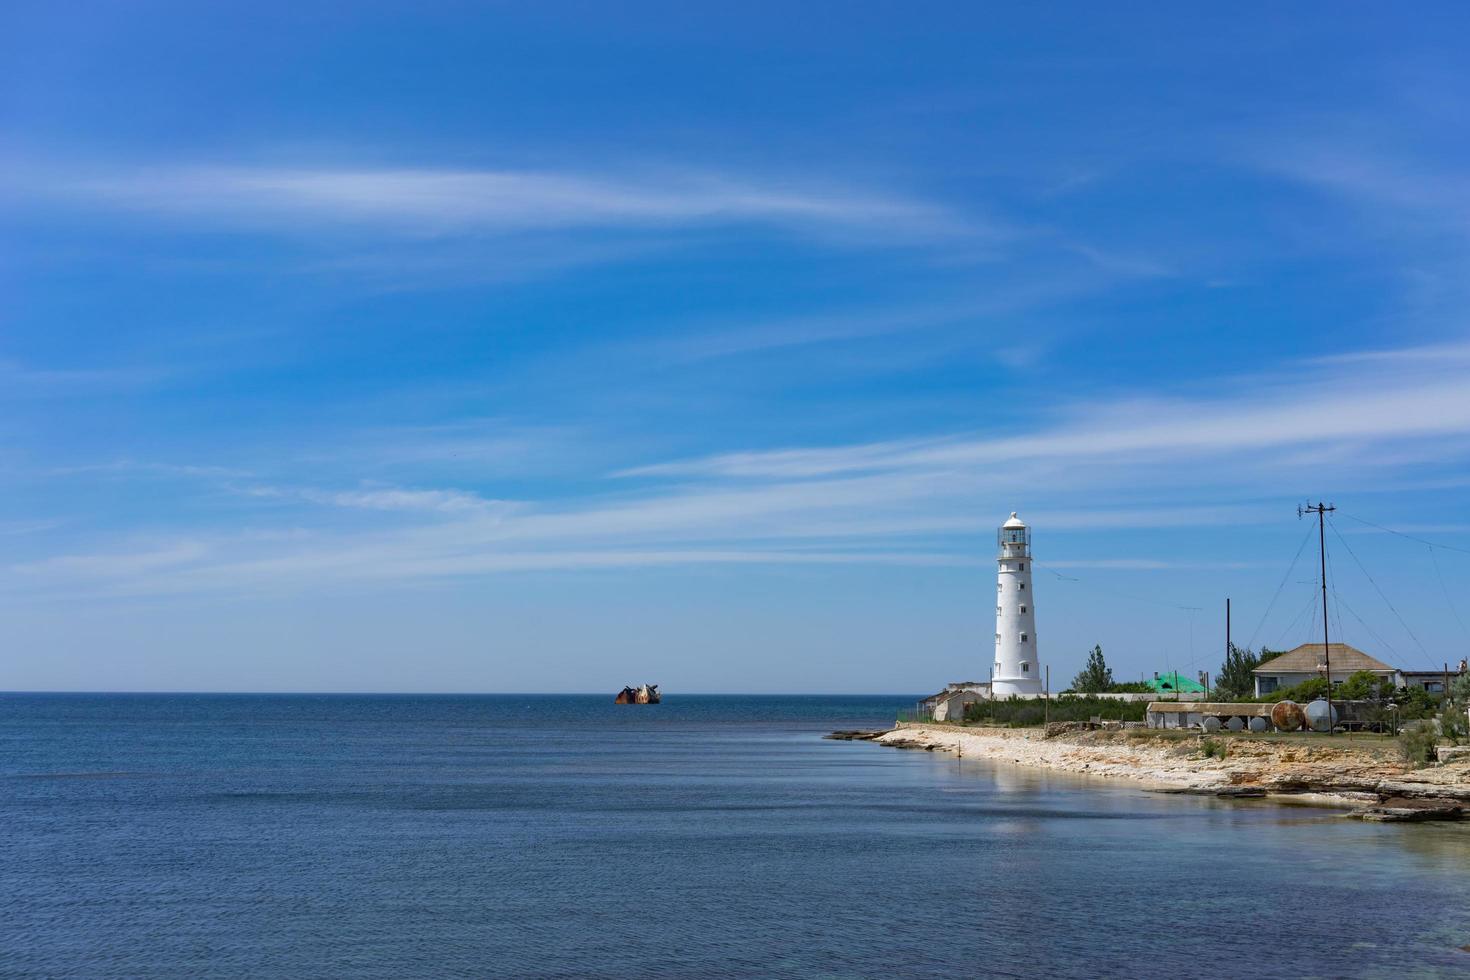 marin avec beau phare blanc sur fond de ciel bleu. photo